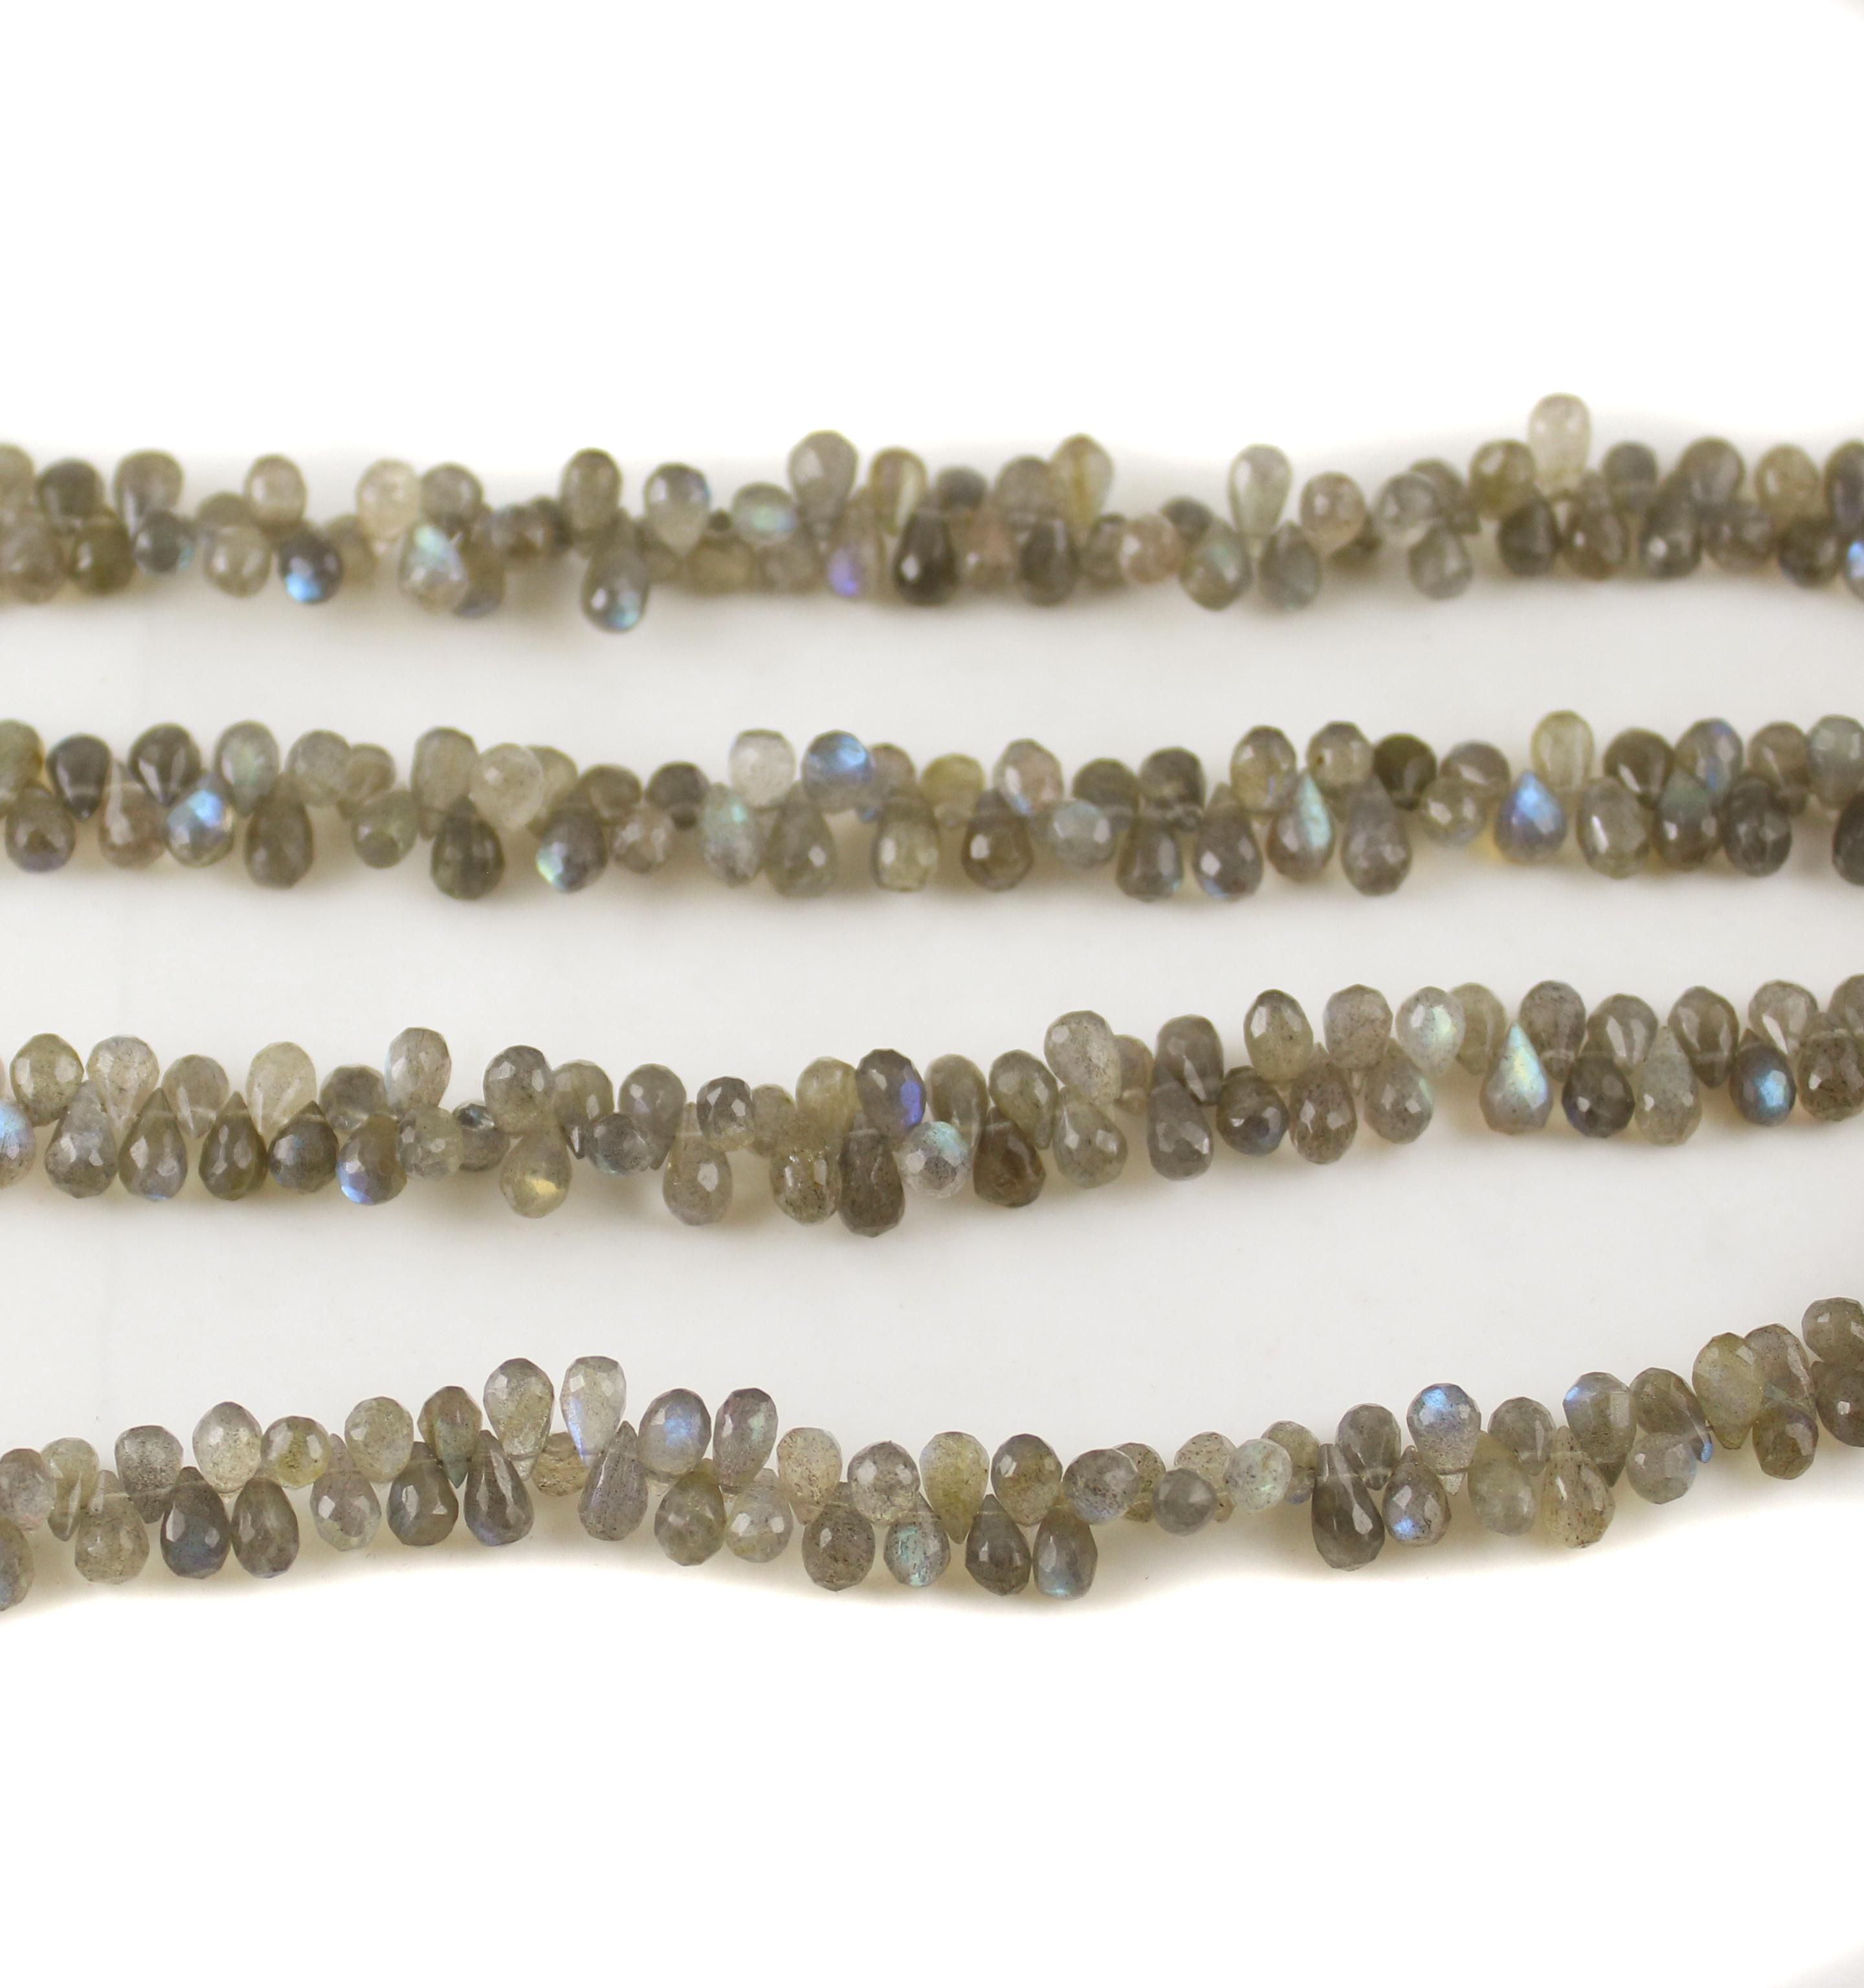 Labradorite Faceted Drop Beads